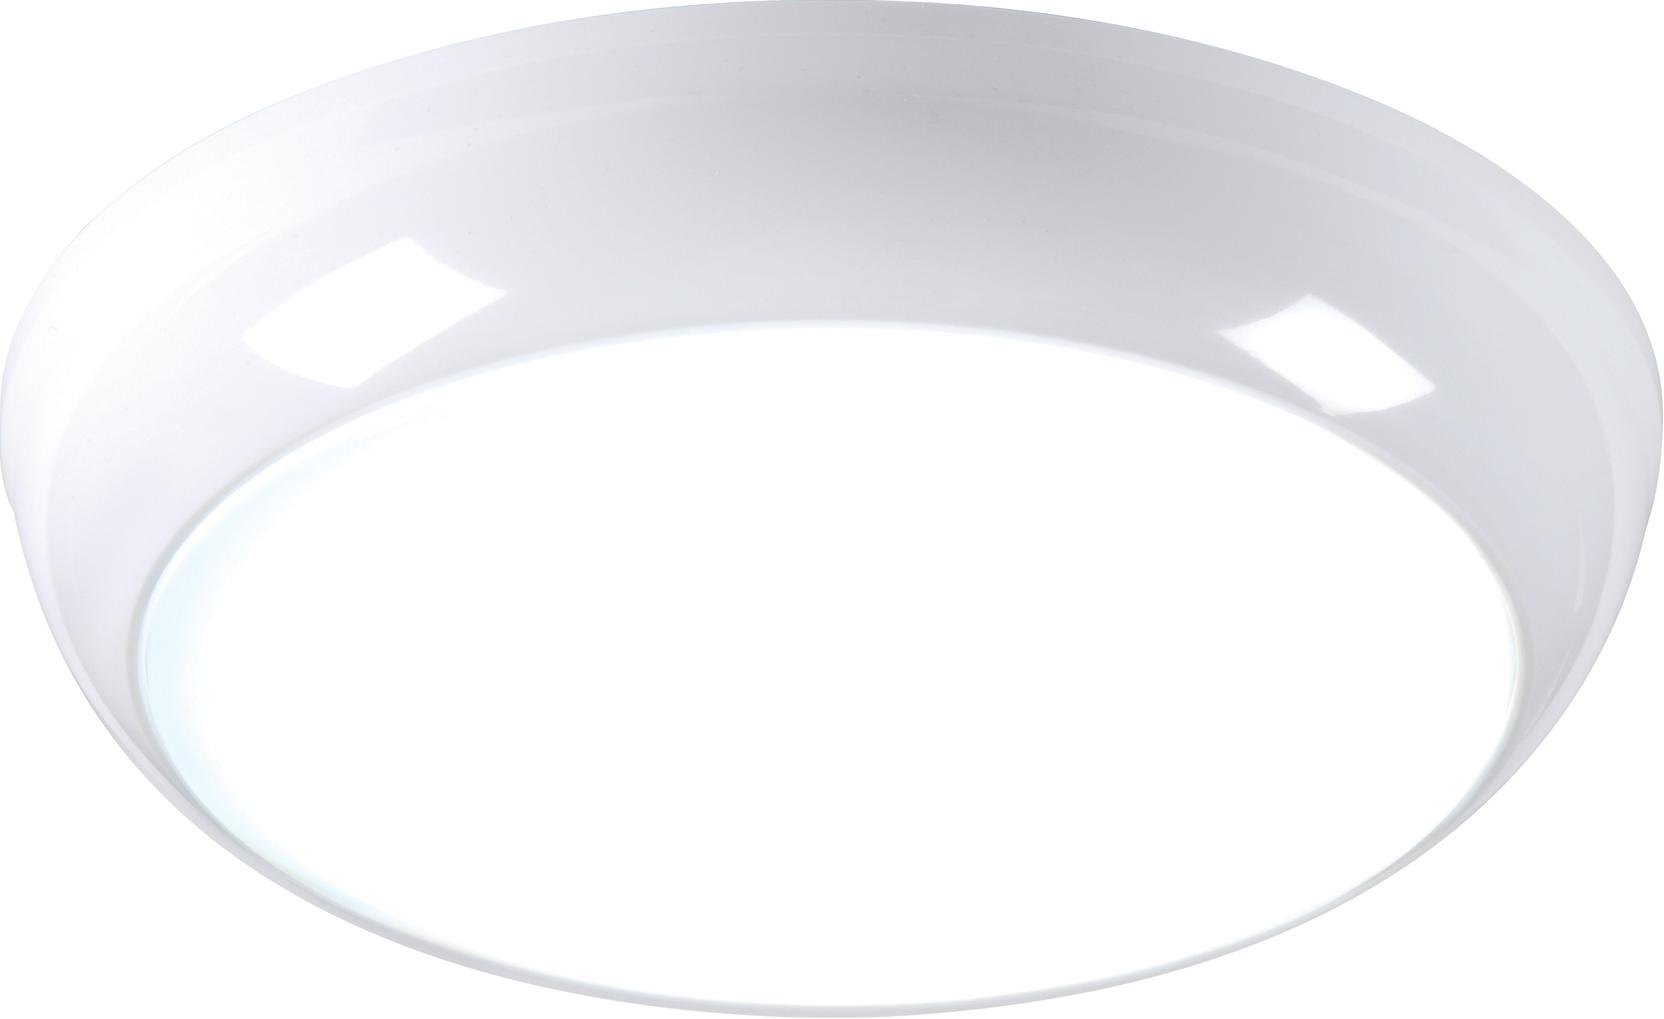 230V IP44 14W LED Bulkhead with Sensor/Dimming Function 6000K